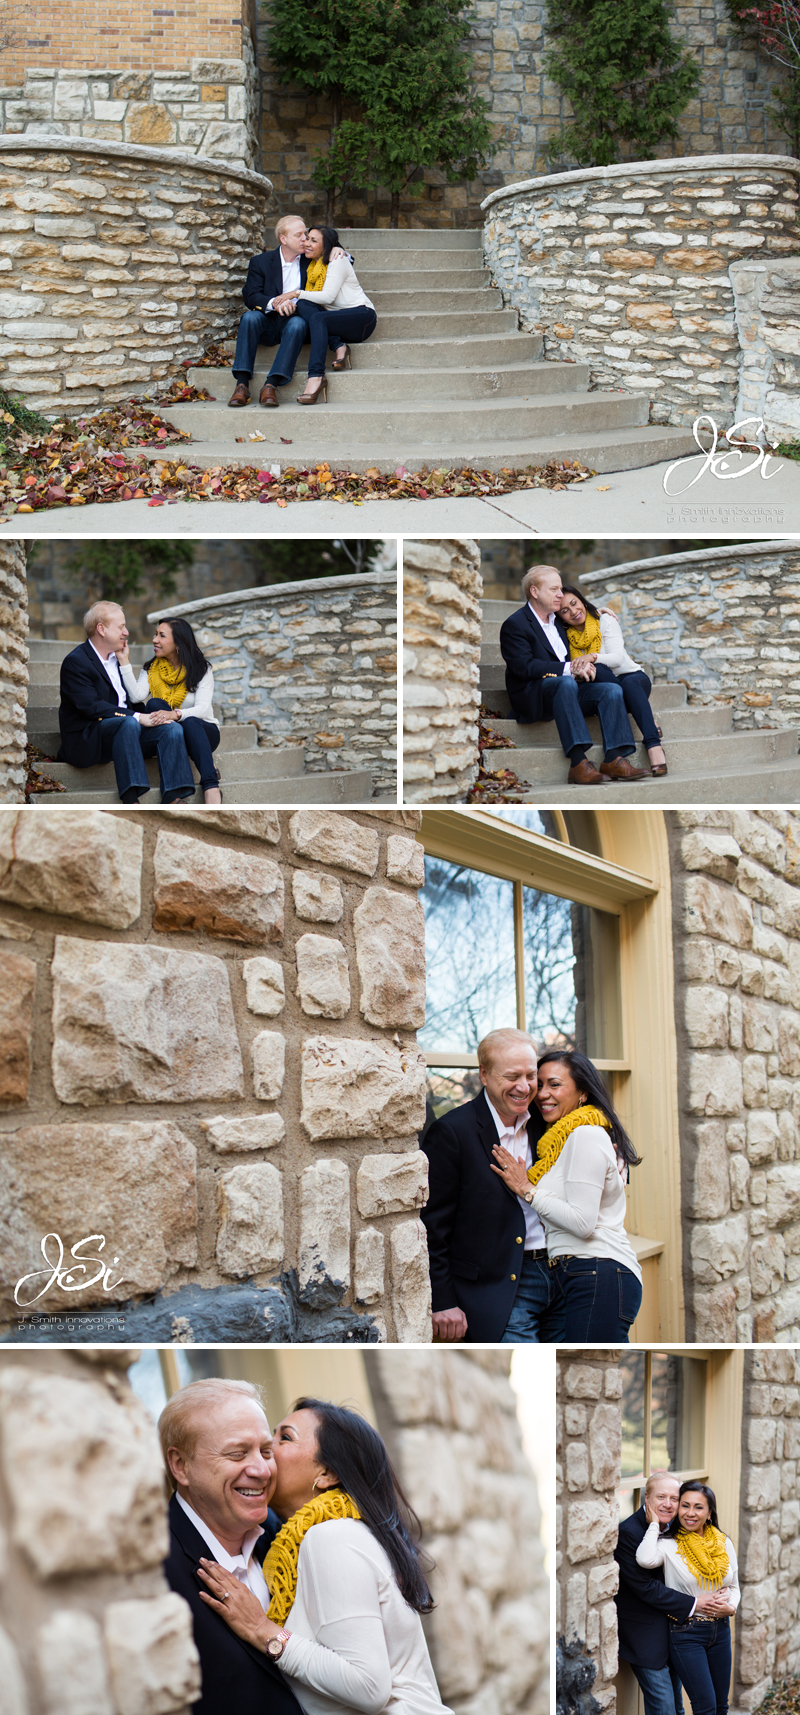 Kansas City Country Club Plaza engagement session photos